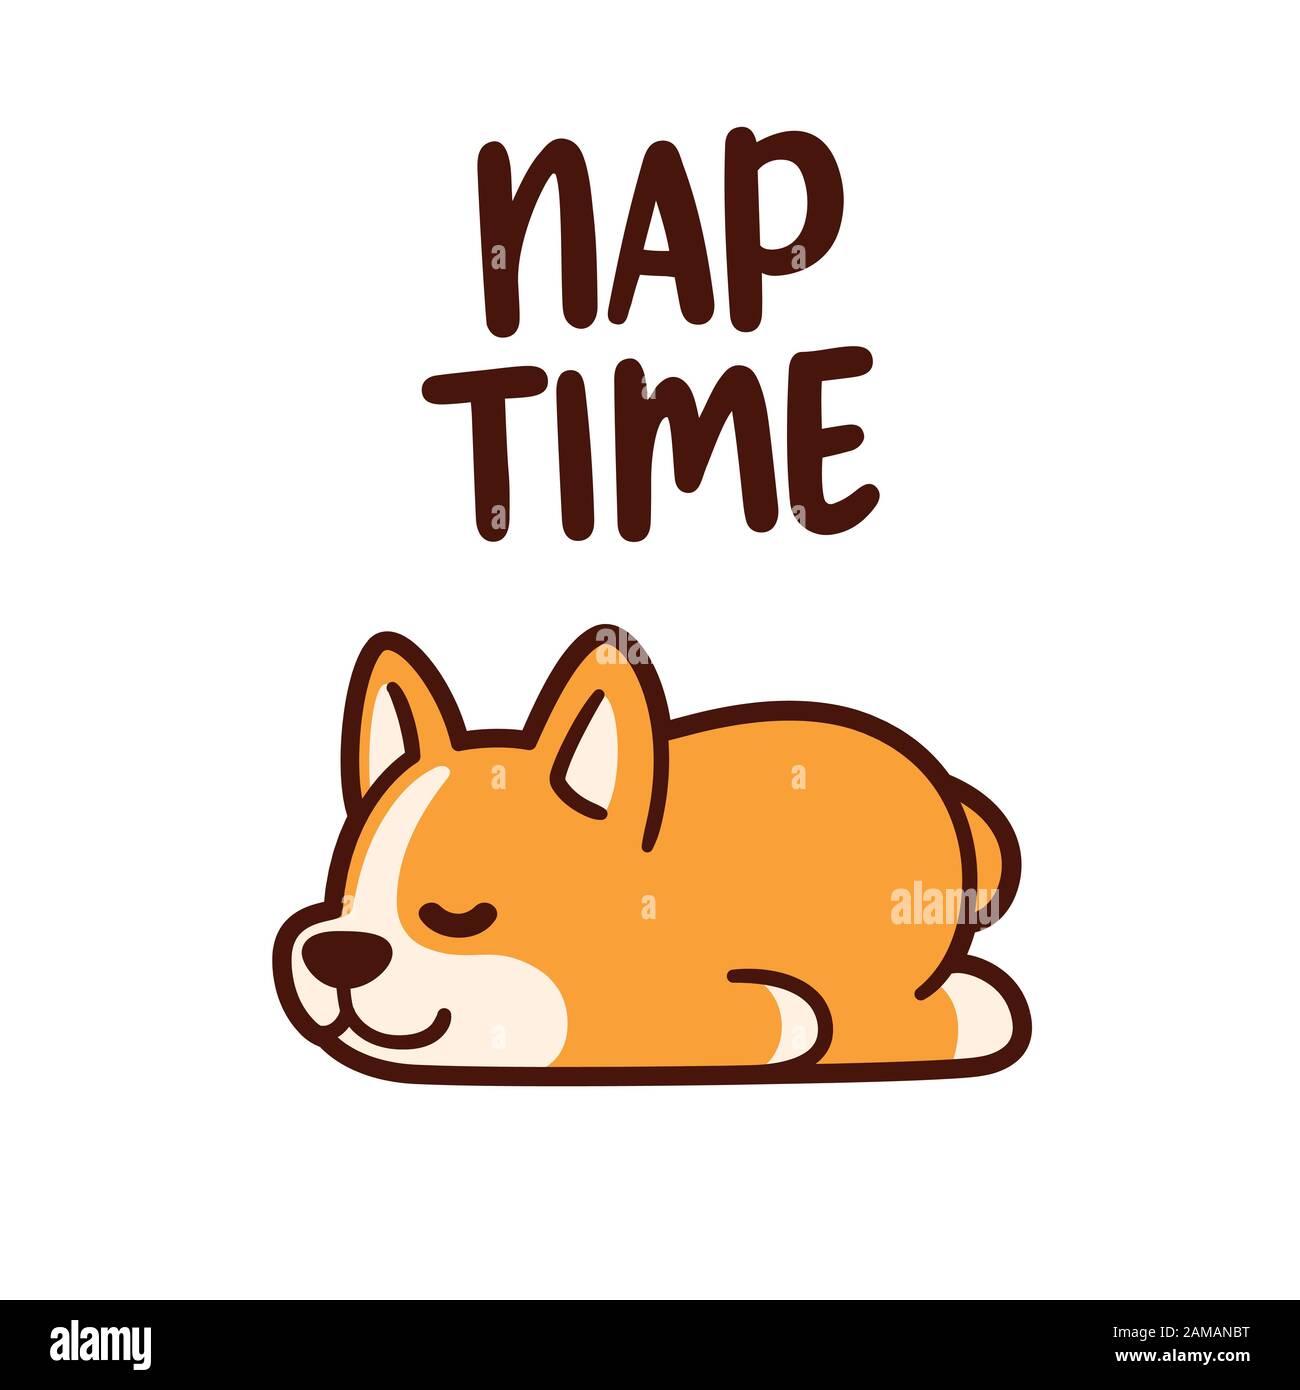 Cute Cartoon Corgi Puppy Sleeping With Text Nap Time Adorable Sleeping Dog Drawing Vector Illustration Stock Vector Image Art Alamy